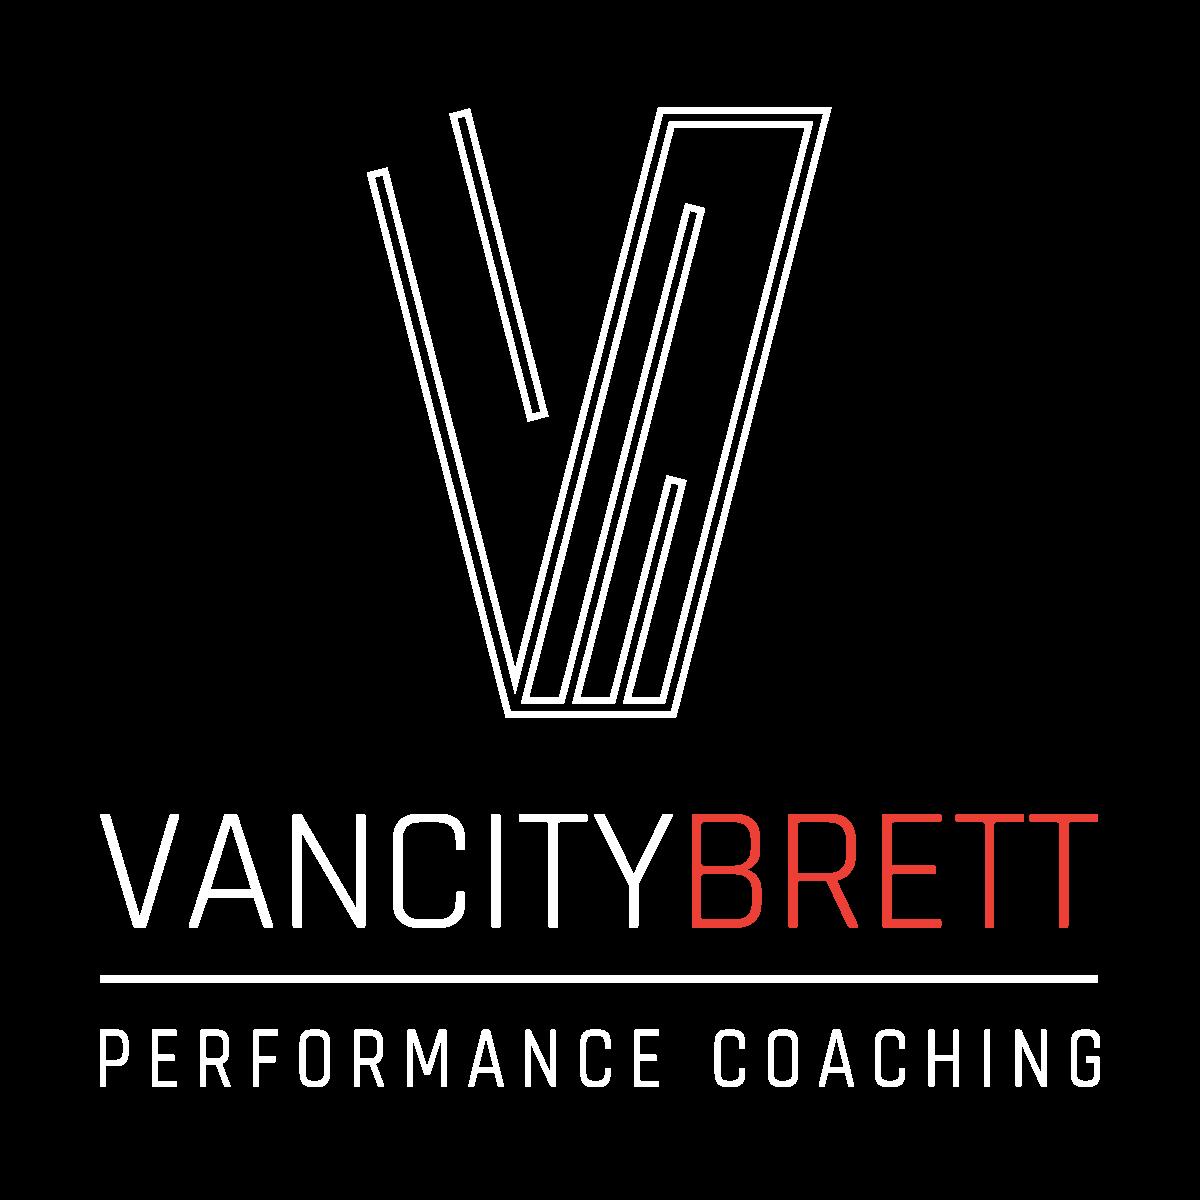 Vancity Brett Main Logo